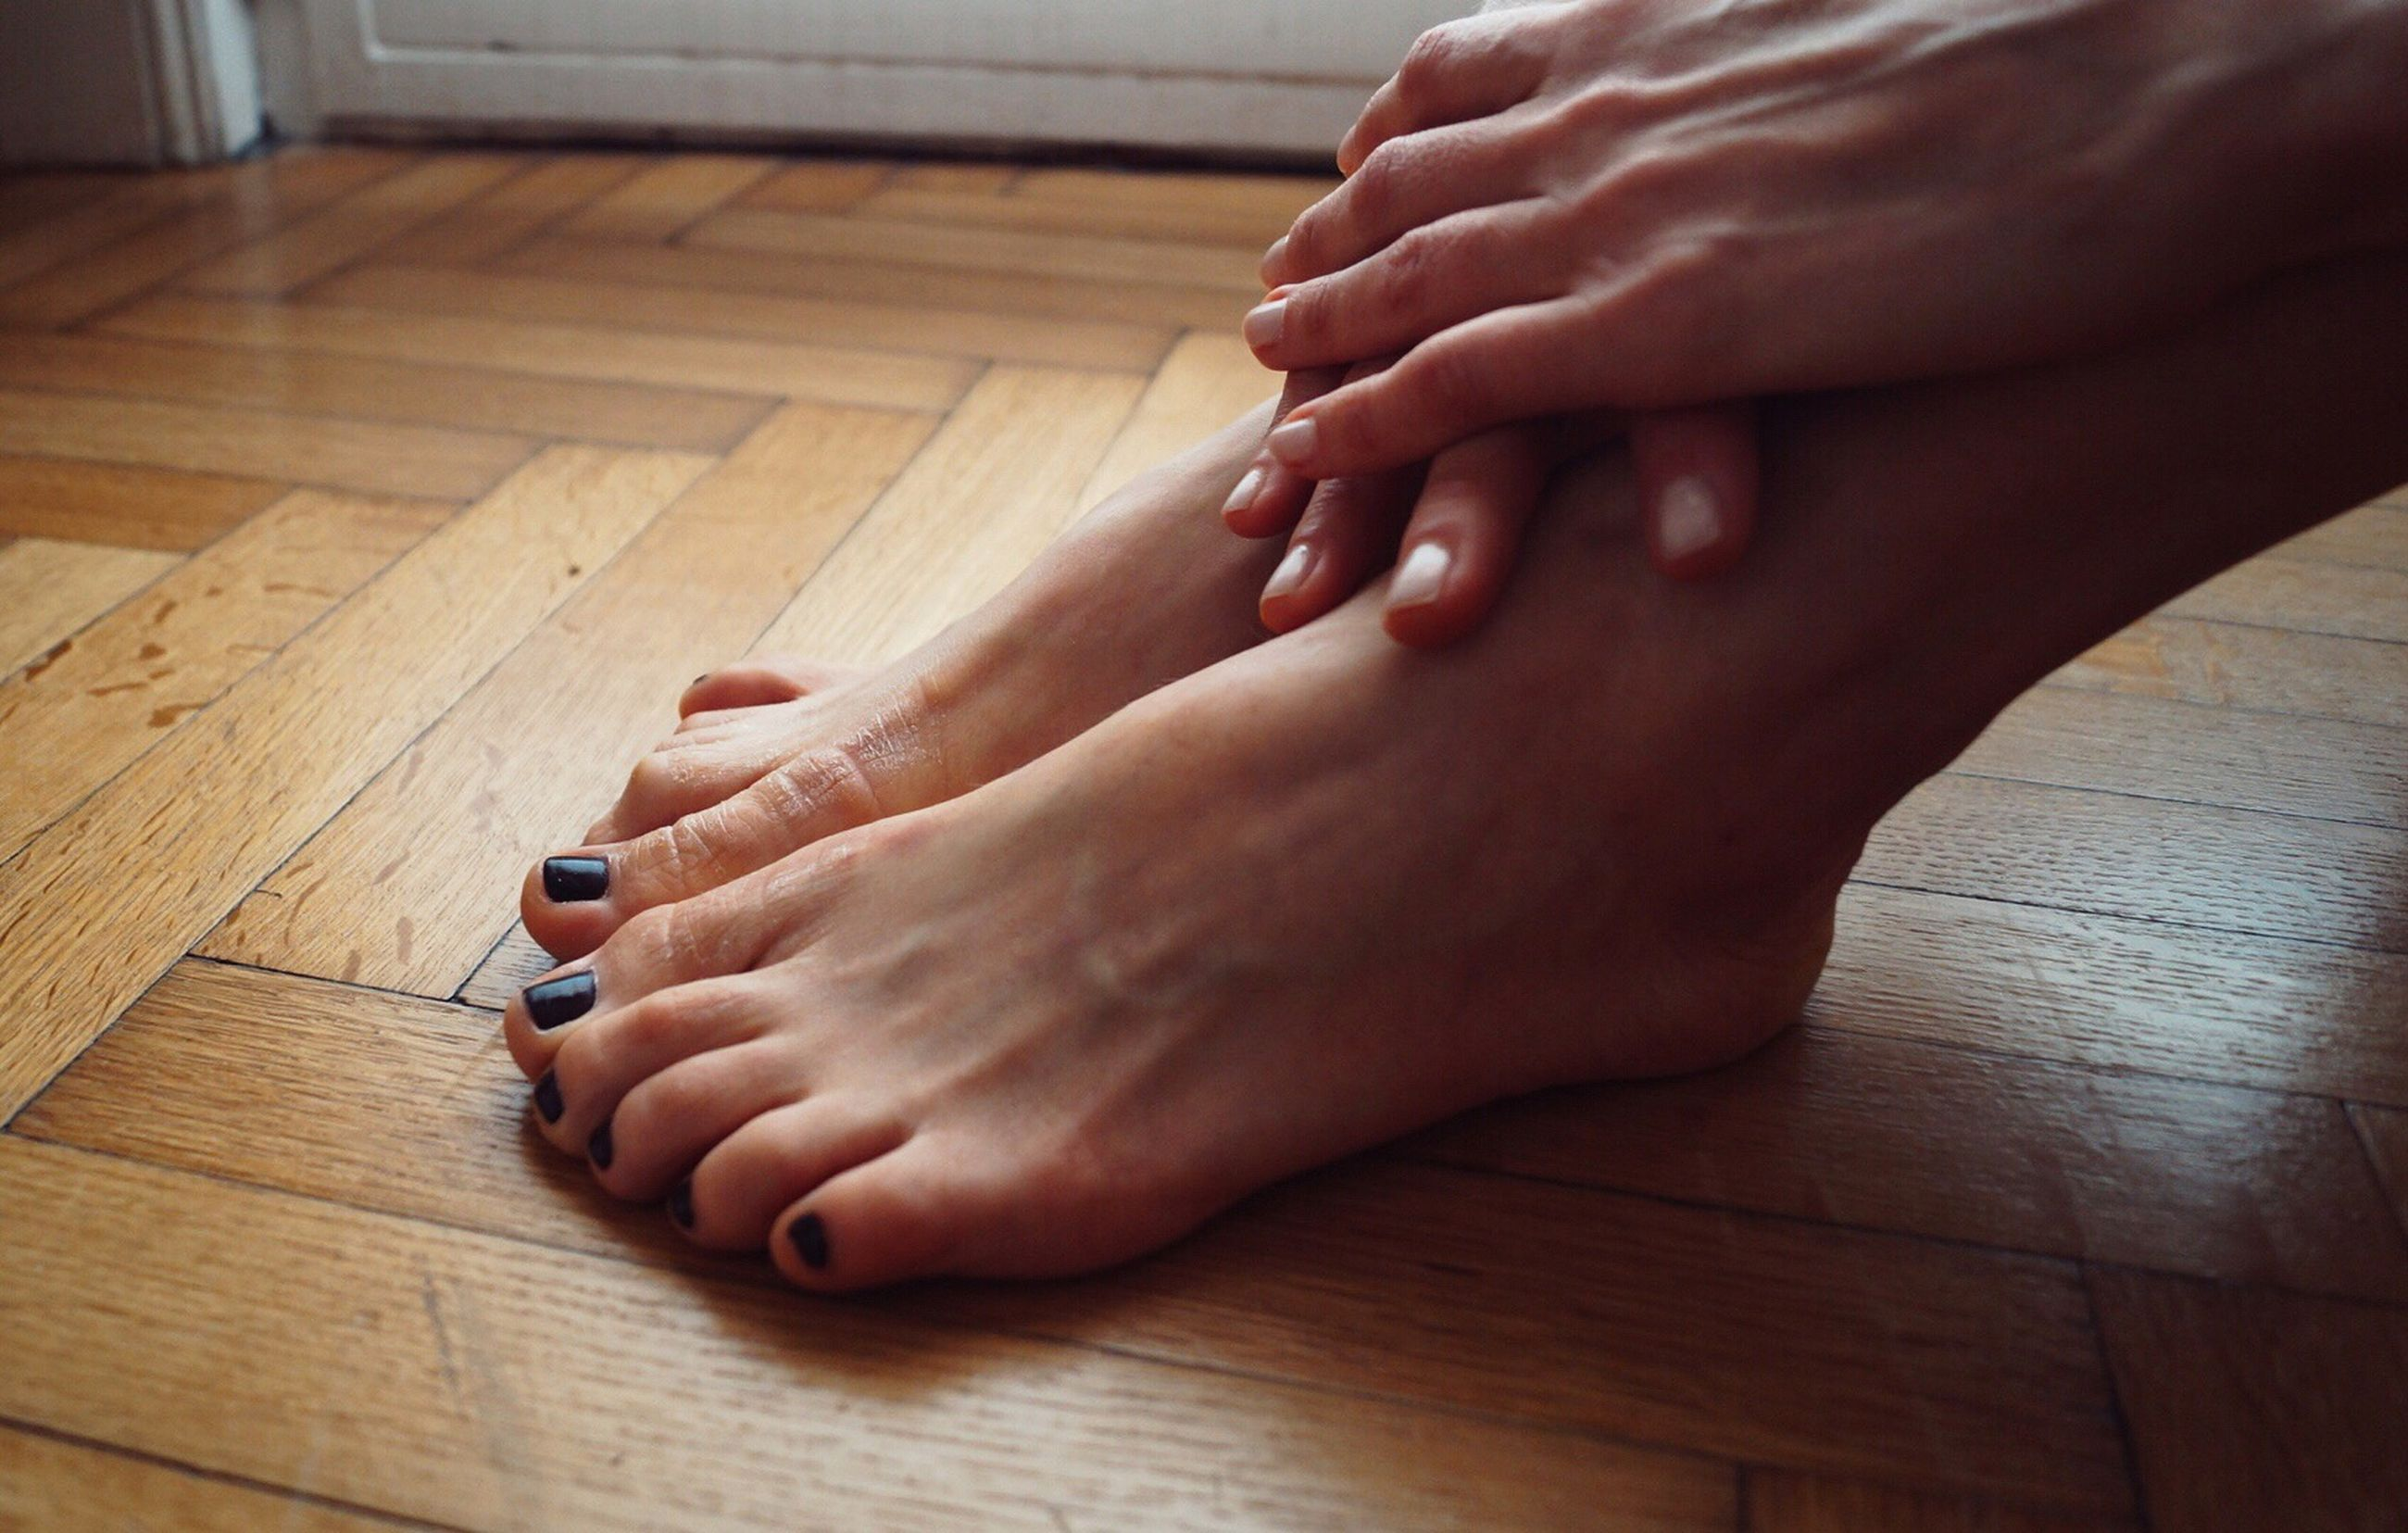 human body part, body part, barefoot, human leg, indoors, human foot, low section, real people, women, wood, flooring, adult, human hand, lifestyles, wood - material, hardwood floor, people, relaxation, hand, human limb, nail, finger, toenail, human toe